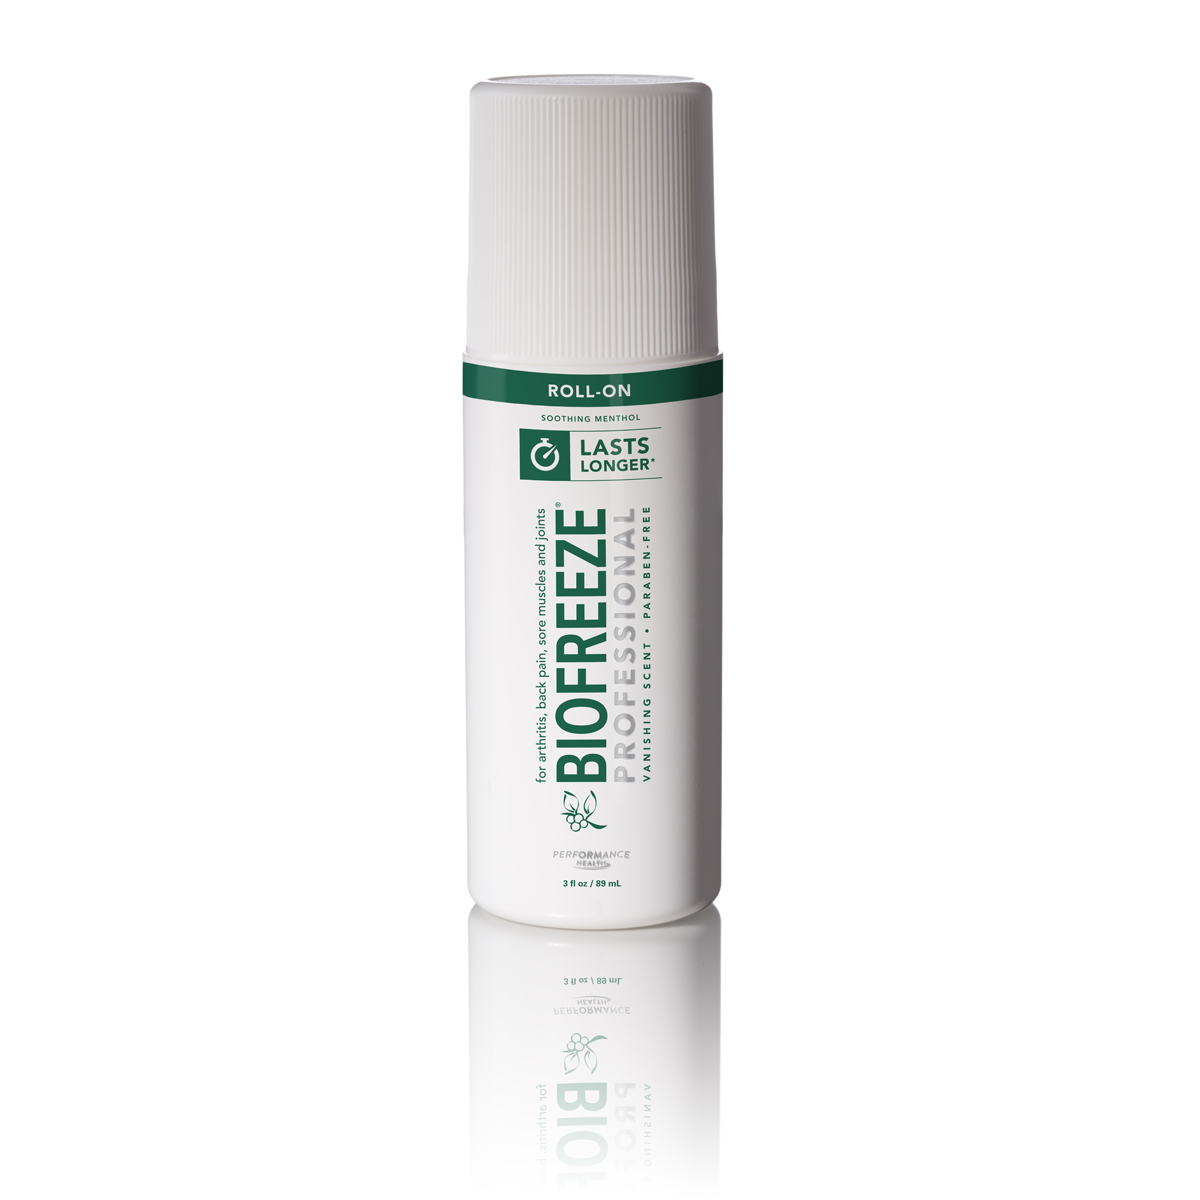 Biofreeze Pain Relief Biofreeze Applicators Analgesics